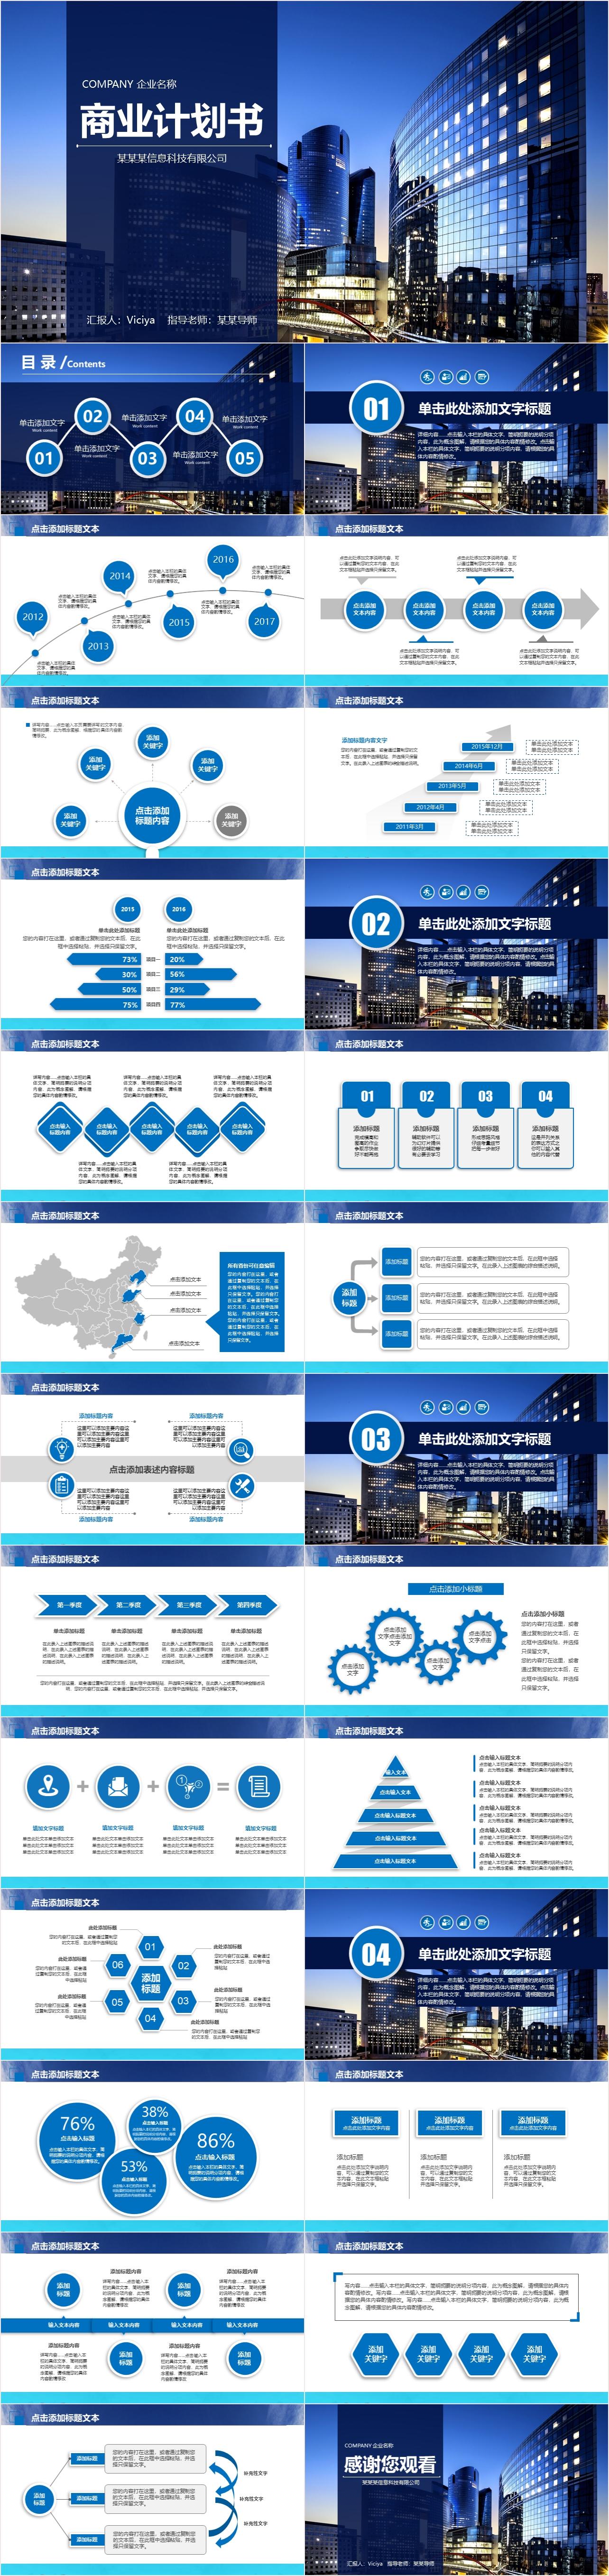 VC0023 商业计划PPT模板